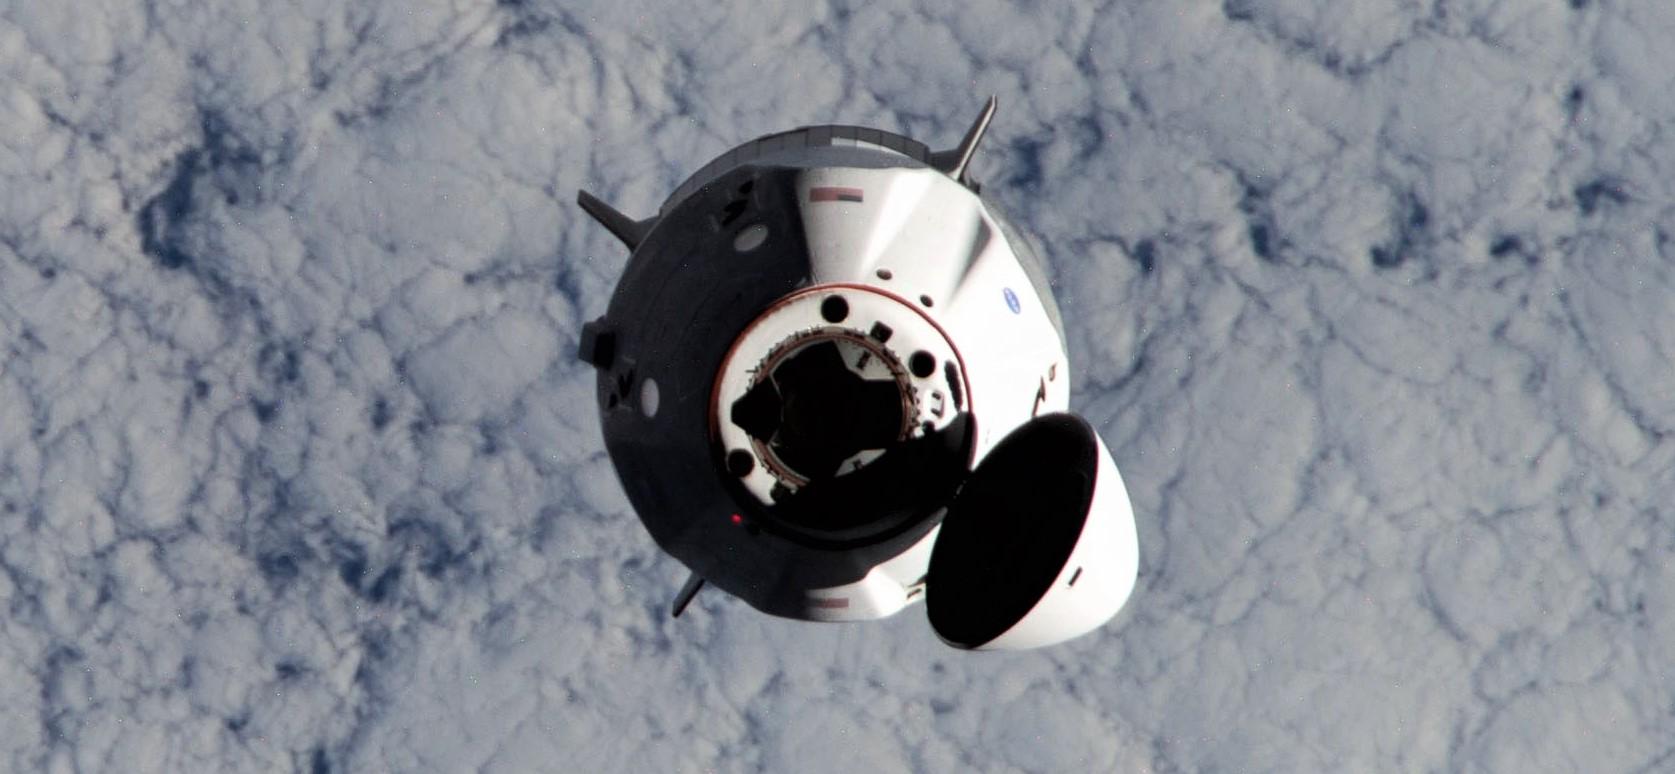 Crew Dragon Crew-1 orbital ops 111620 (NASA) ISS approach 2 crop 1